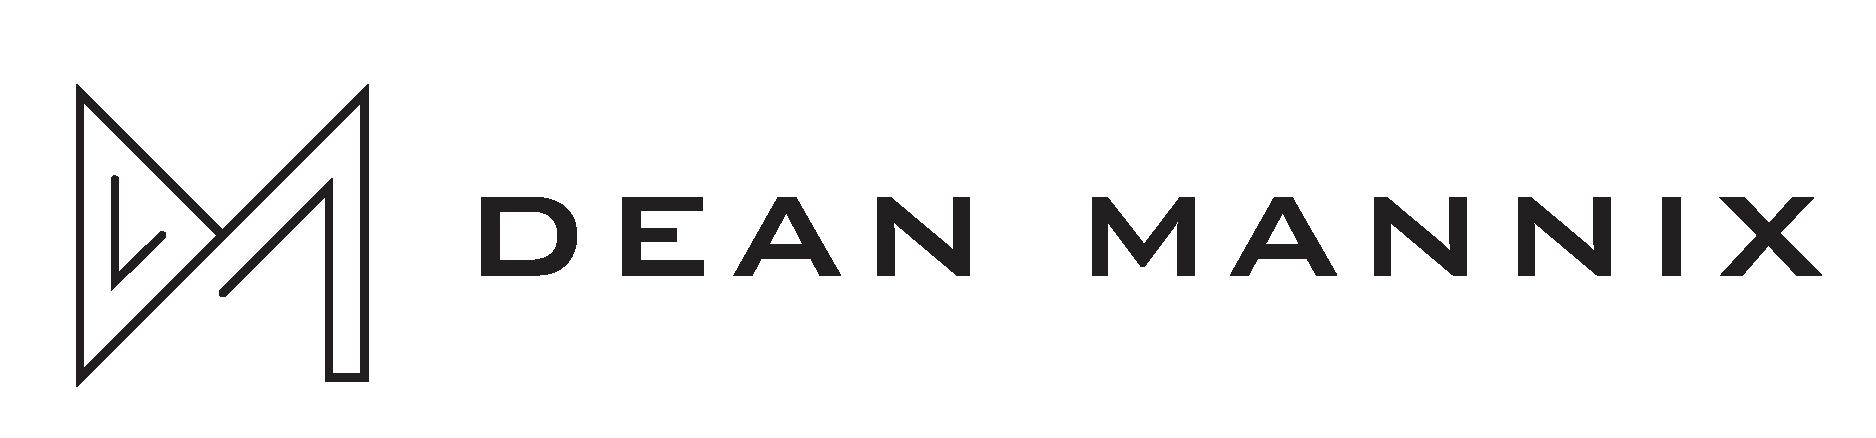 Dean Mannix